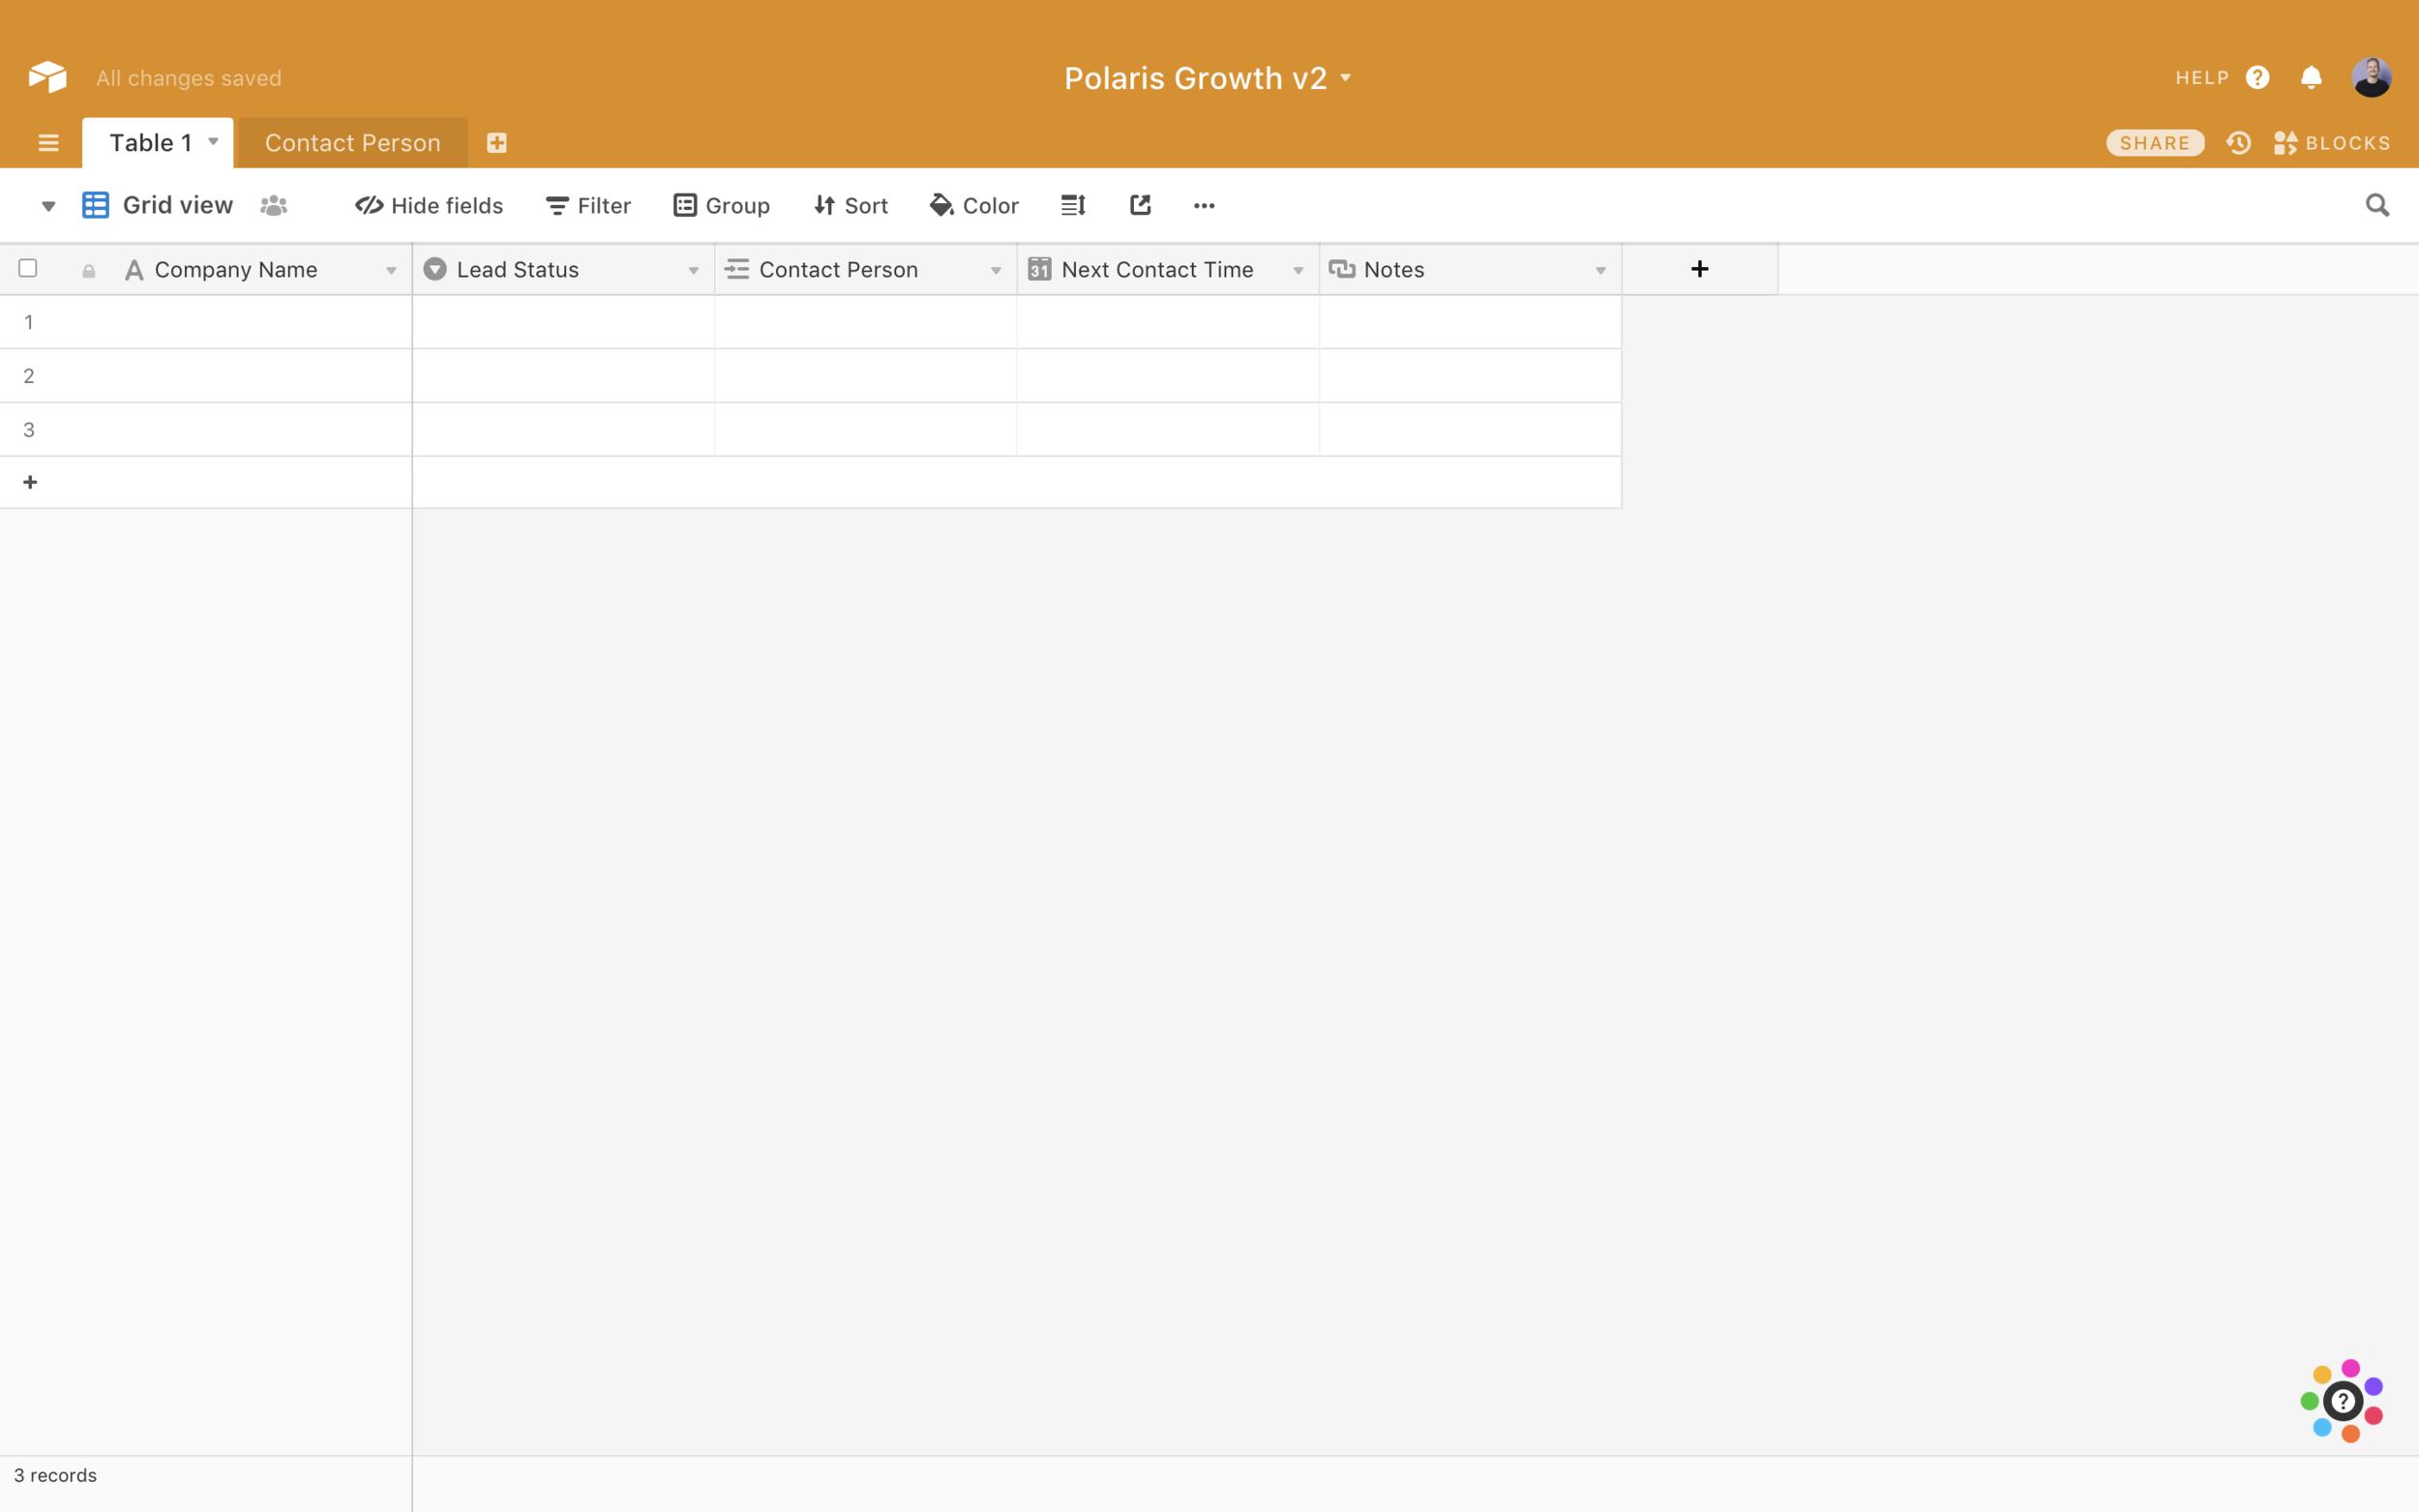 Screenshot 2019-04-25 11.35.49(2).png